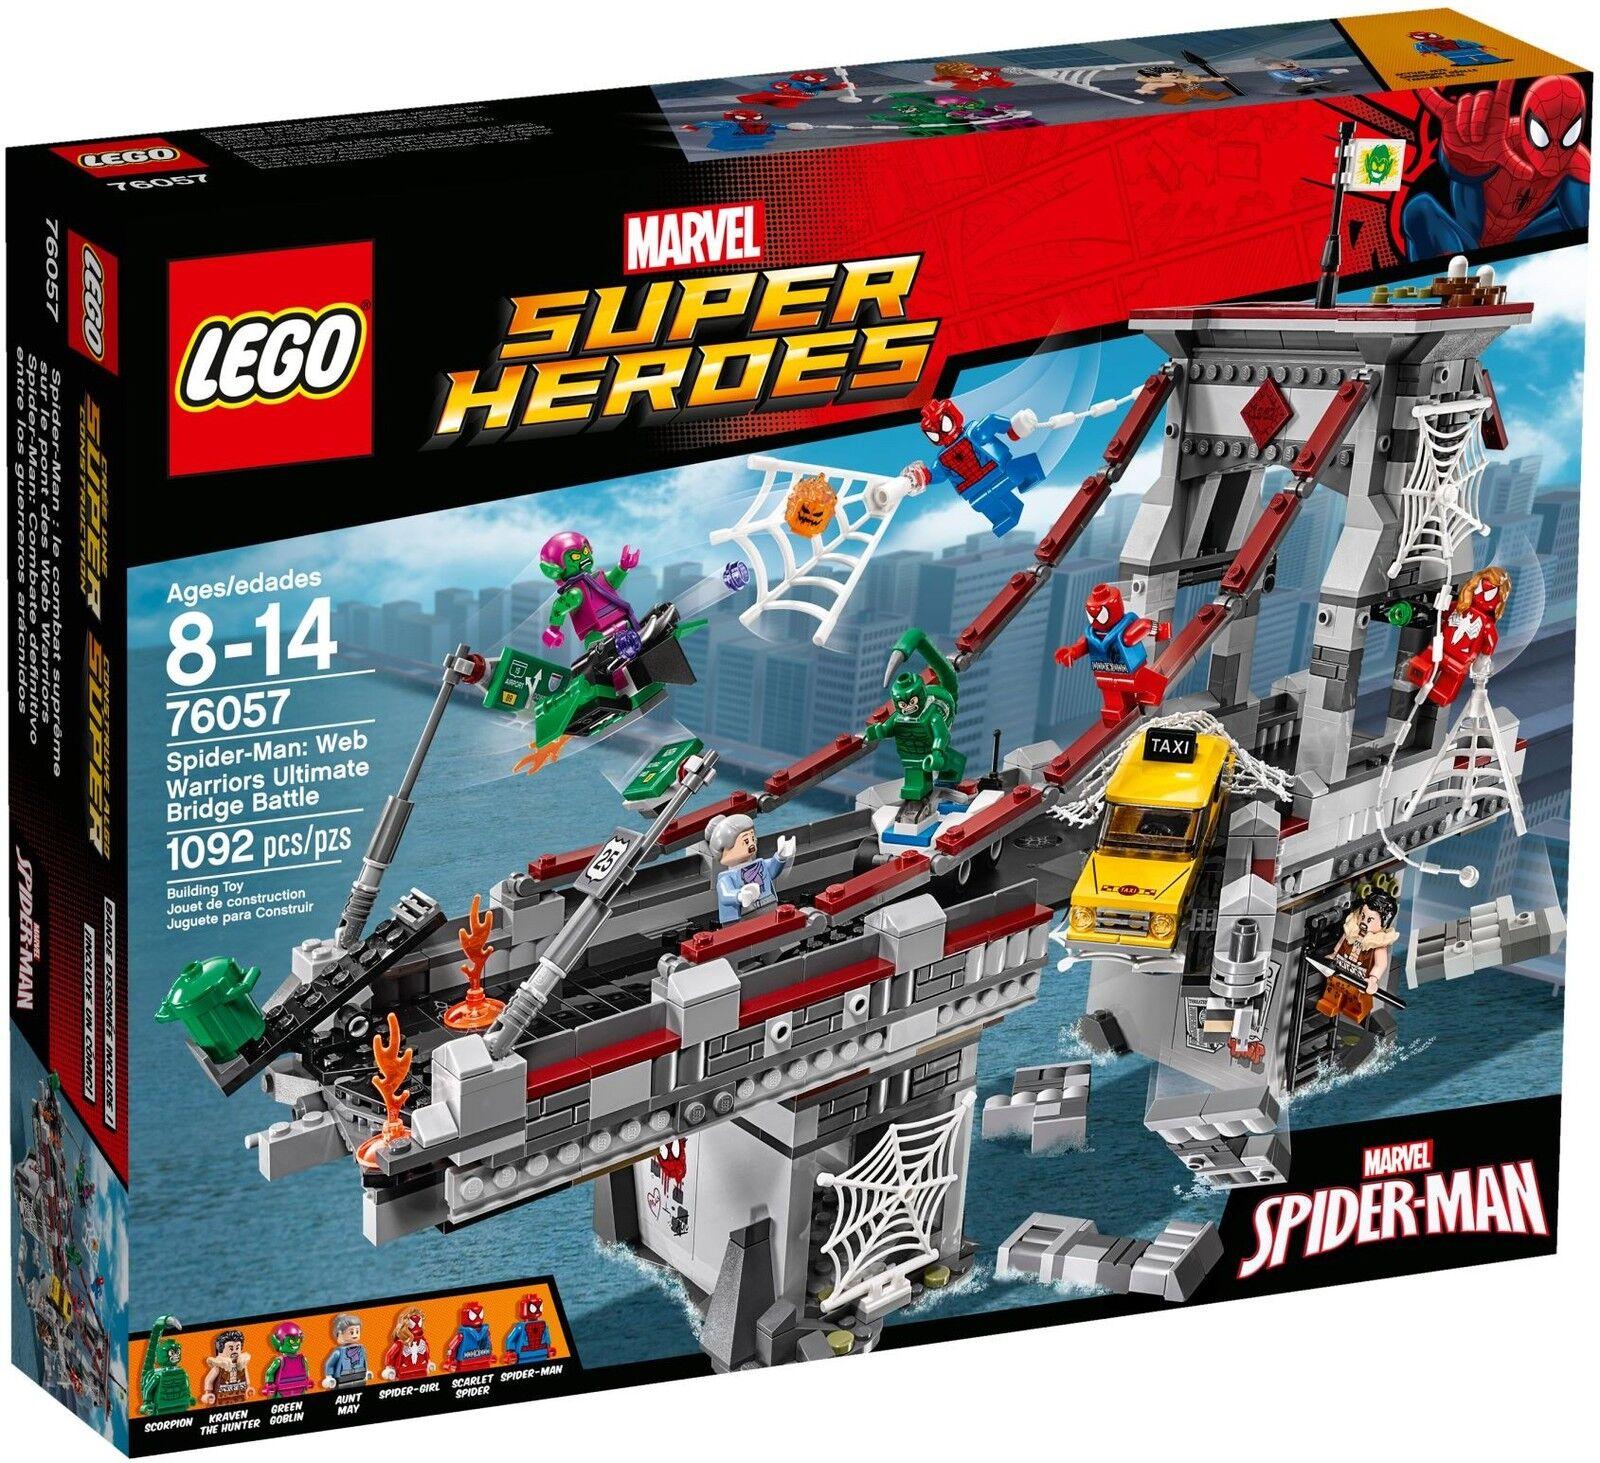 LEGO Marvel Superheroes - 76057 Web Warriors  ULTIMATE Bridge Battle-nuovo & OVP  spedizione veloce a te